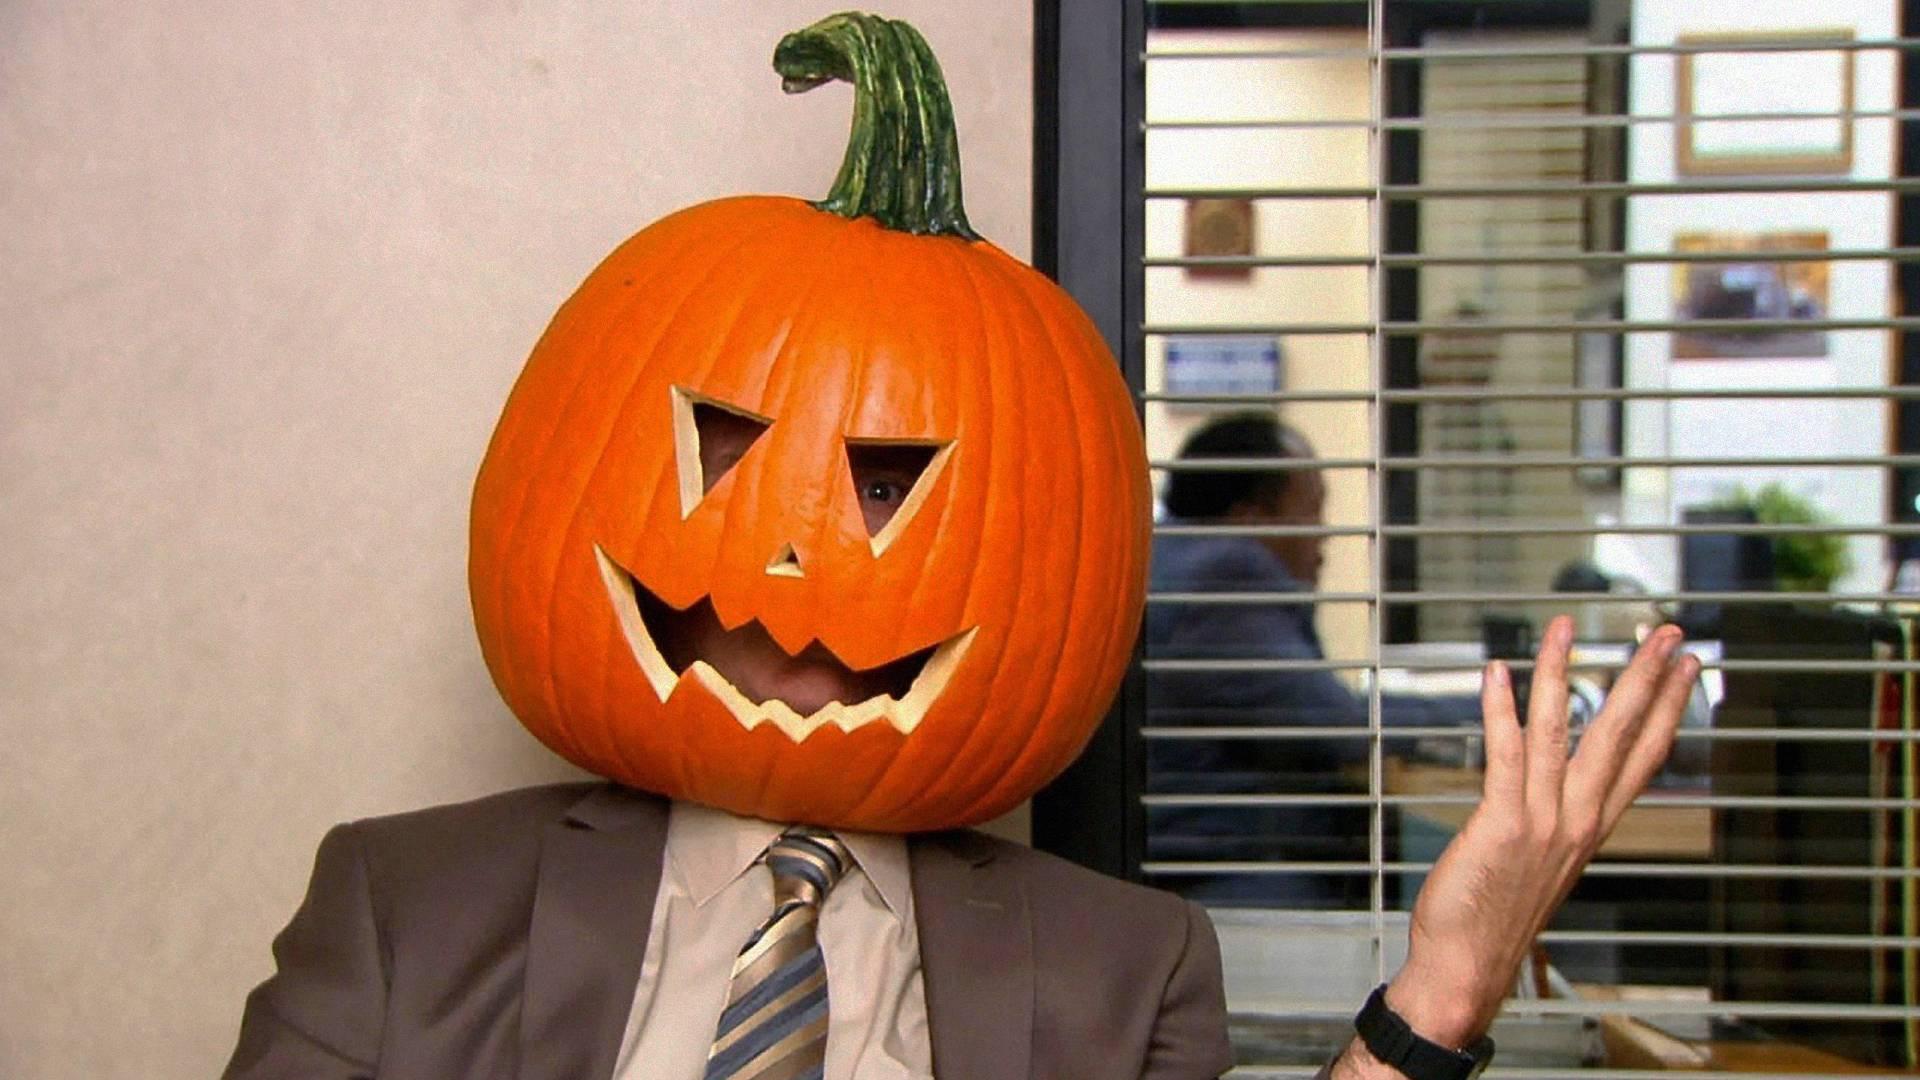 The Office Season 9 Episode 5